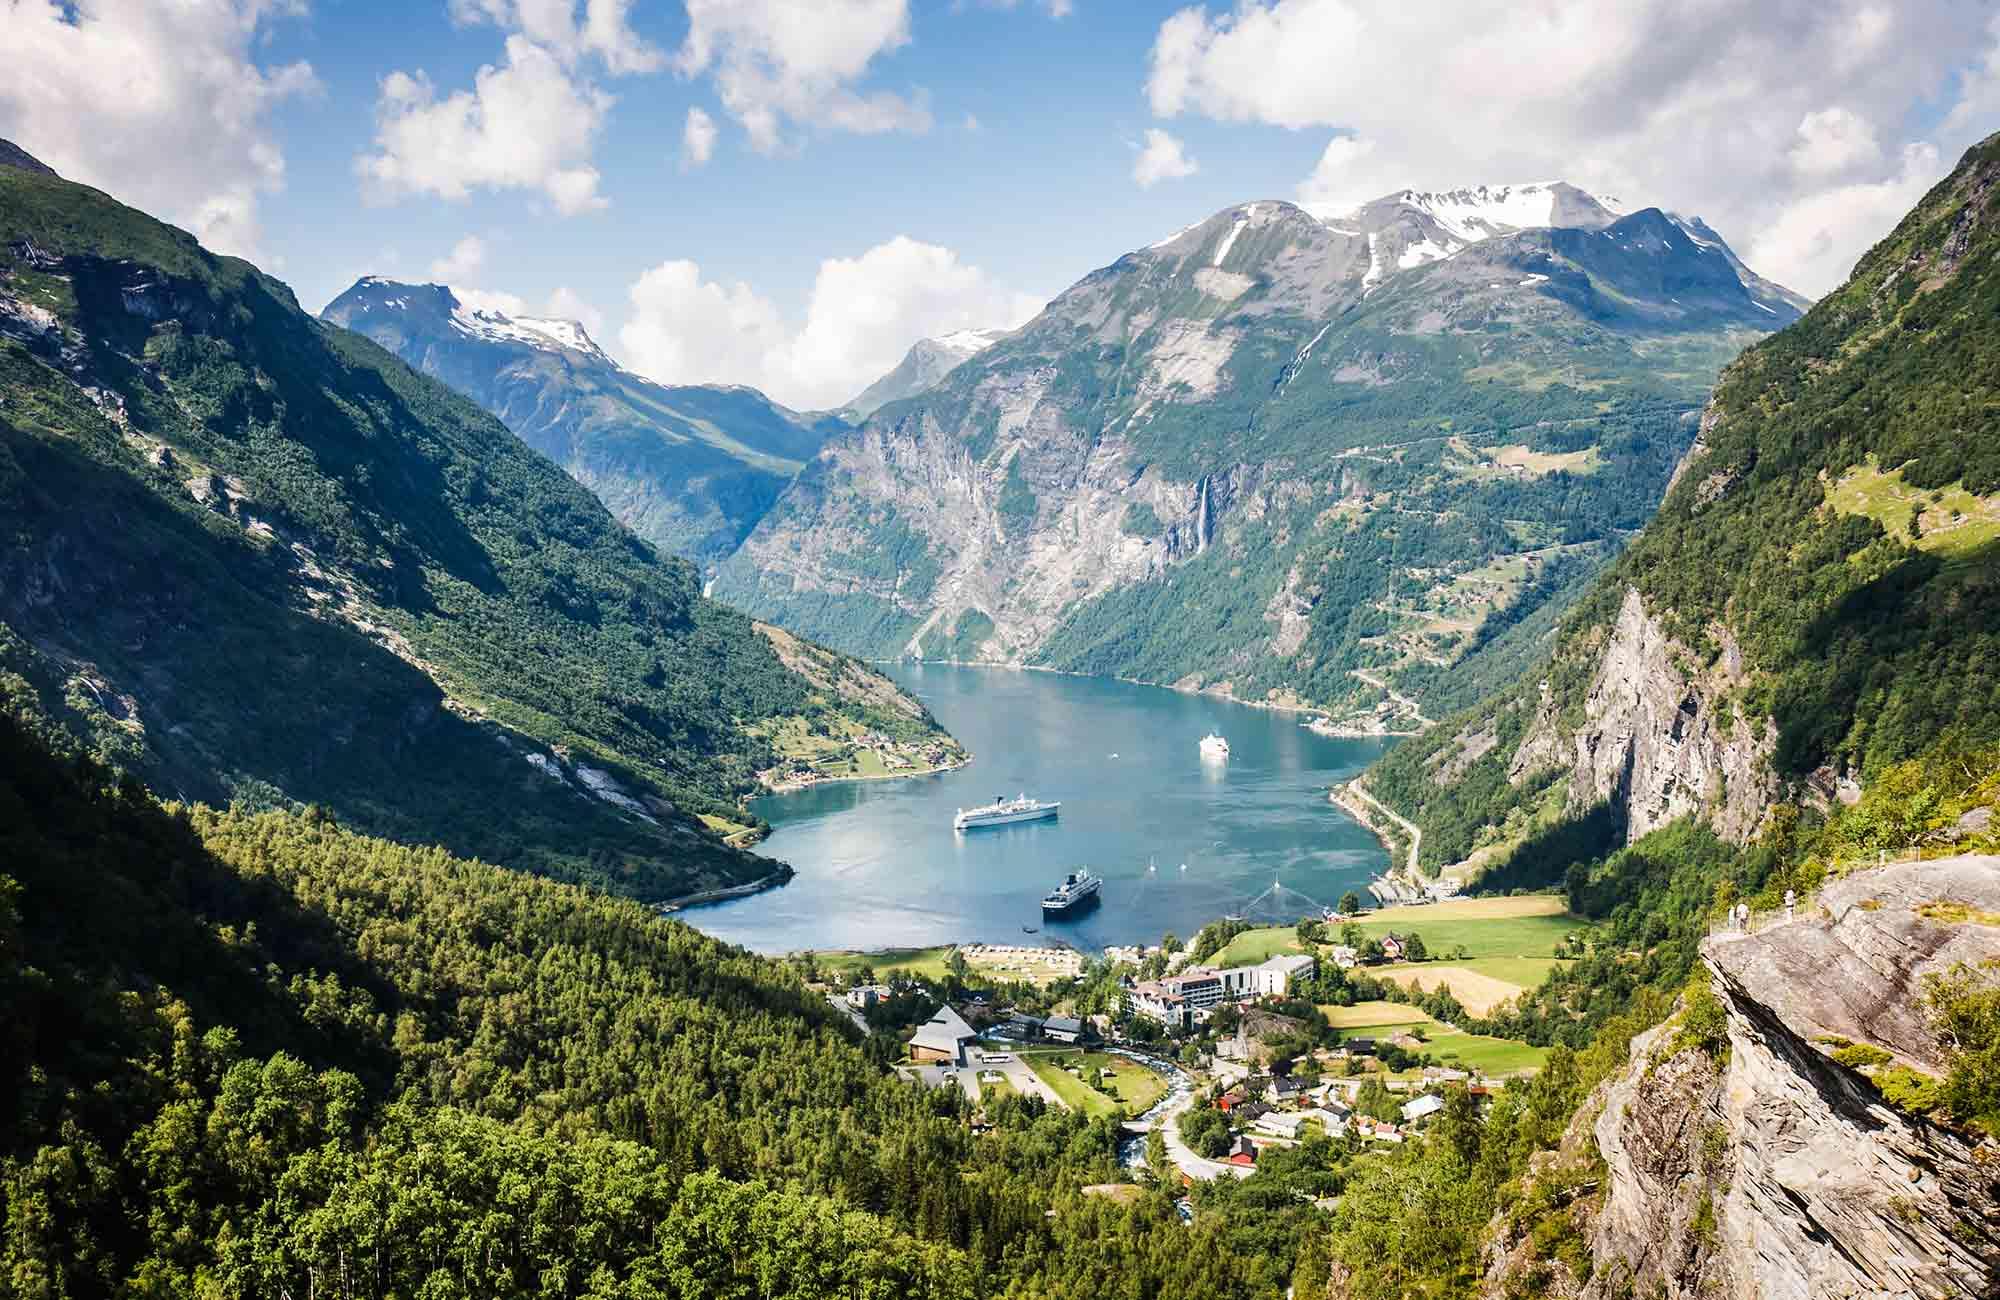 Voyage Norvège - Geirangerfjord - Amplitudes